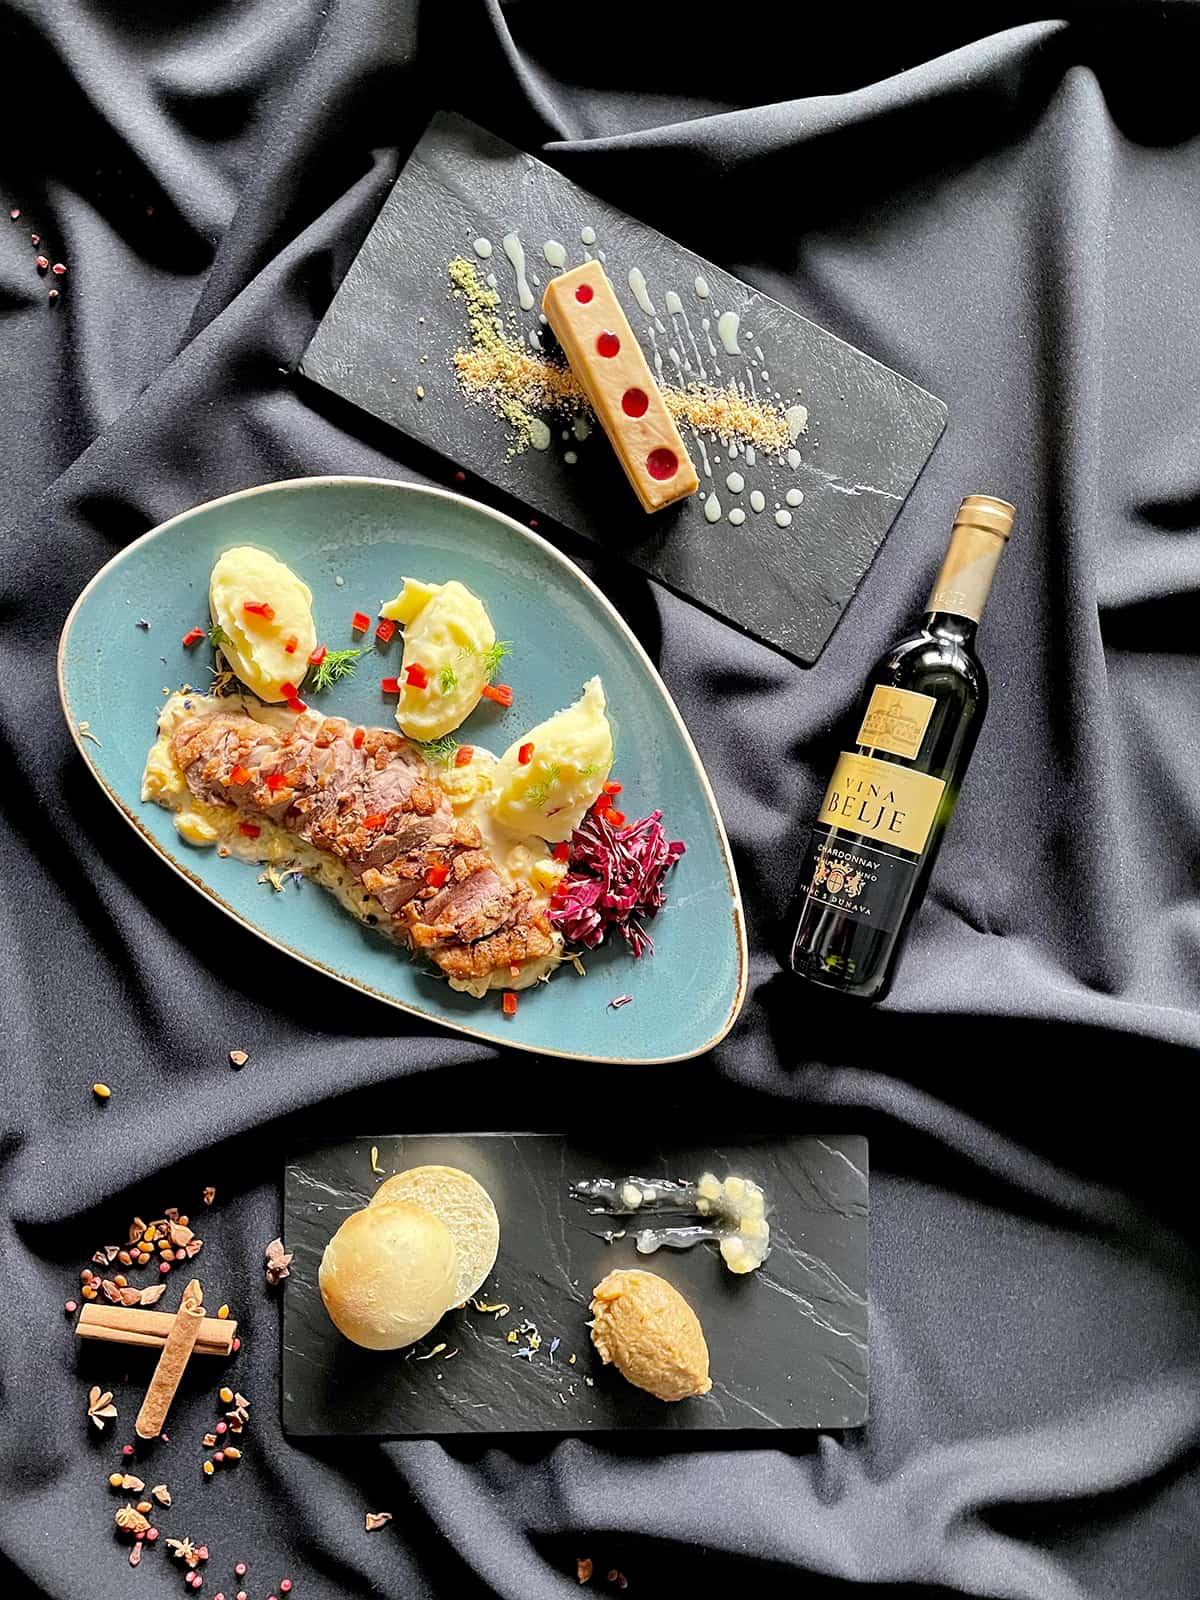 Hrana i vino na crnoj pozadini